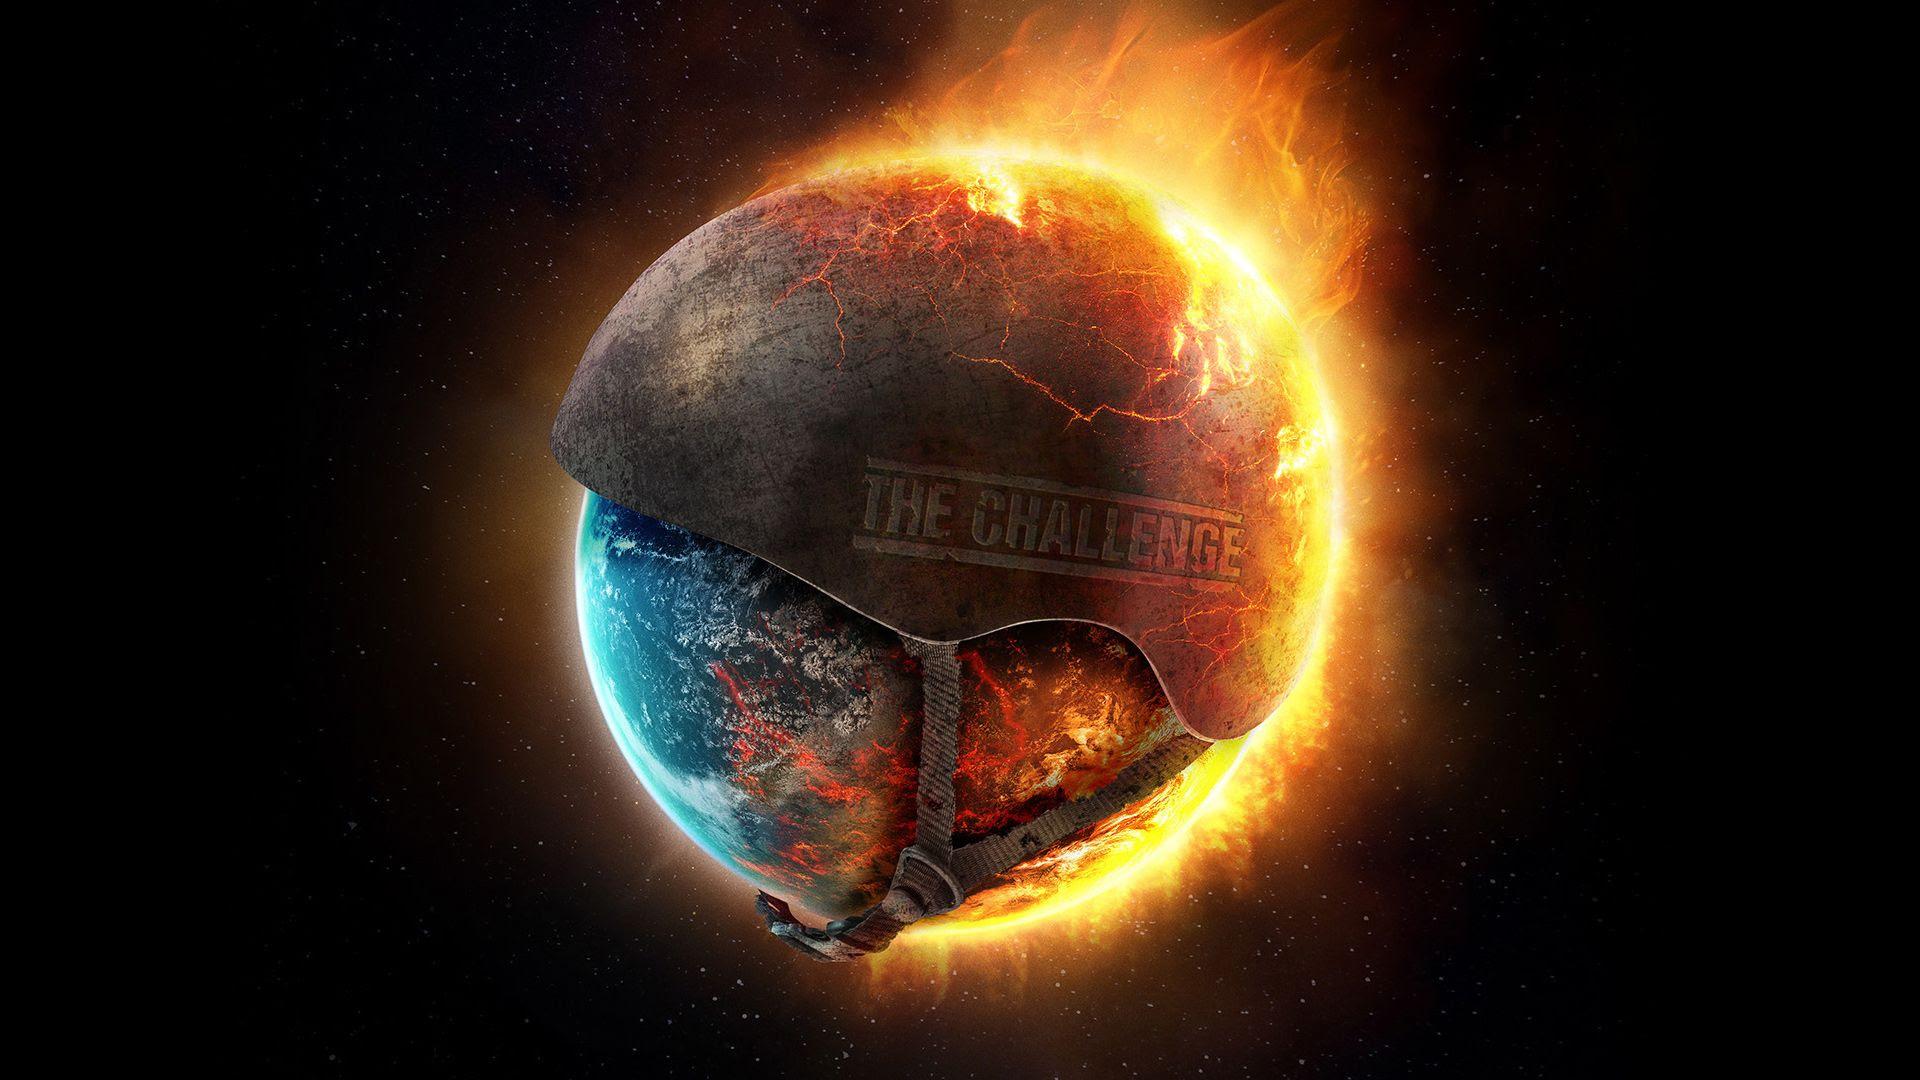 The Challenge War Of The Worlds Season 33 Episodes Tv Series